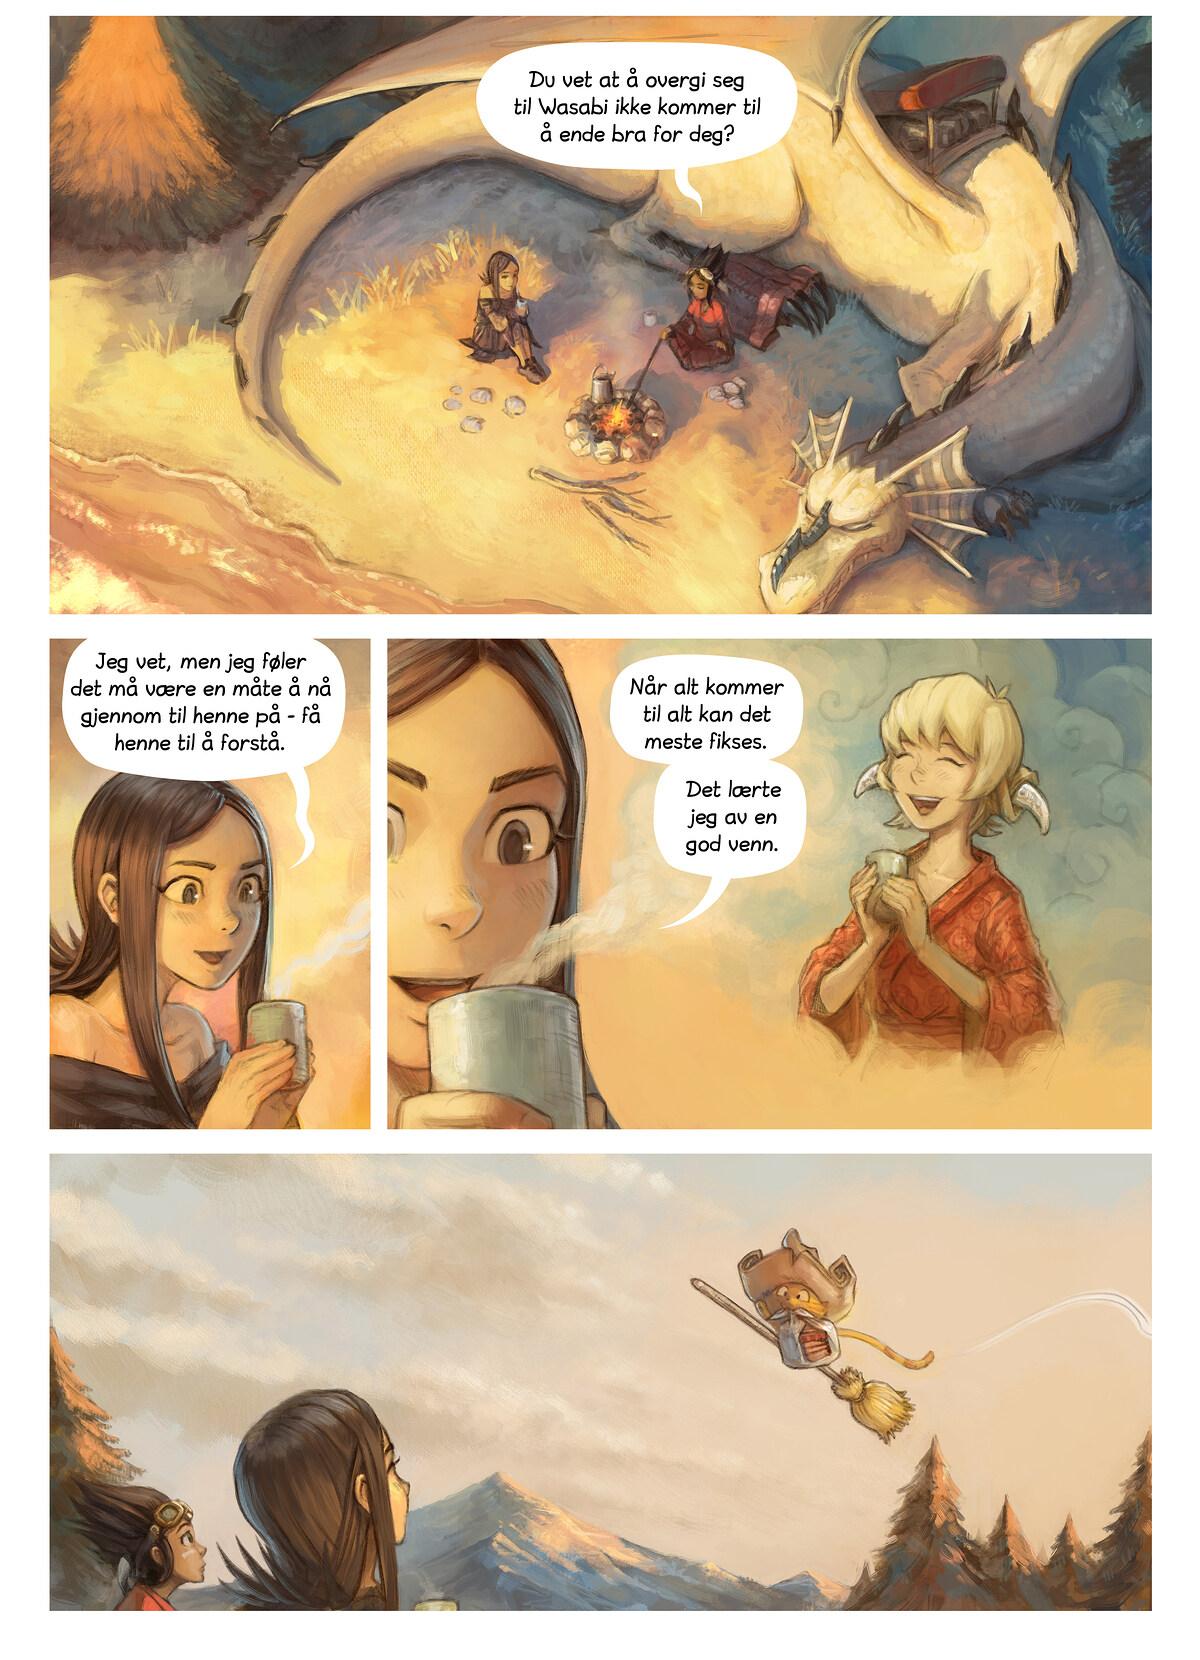 Episode 35: Tid for ettertanke, Page 10